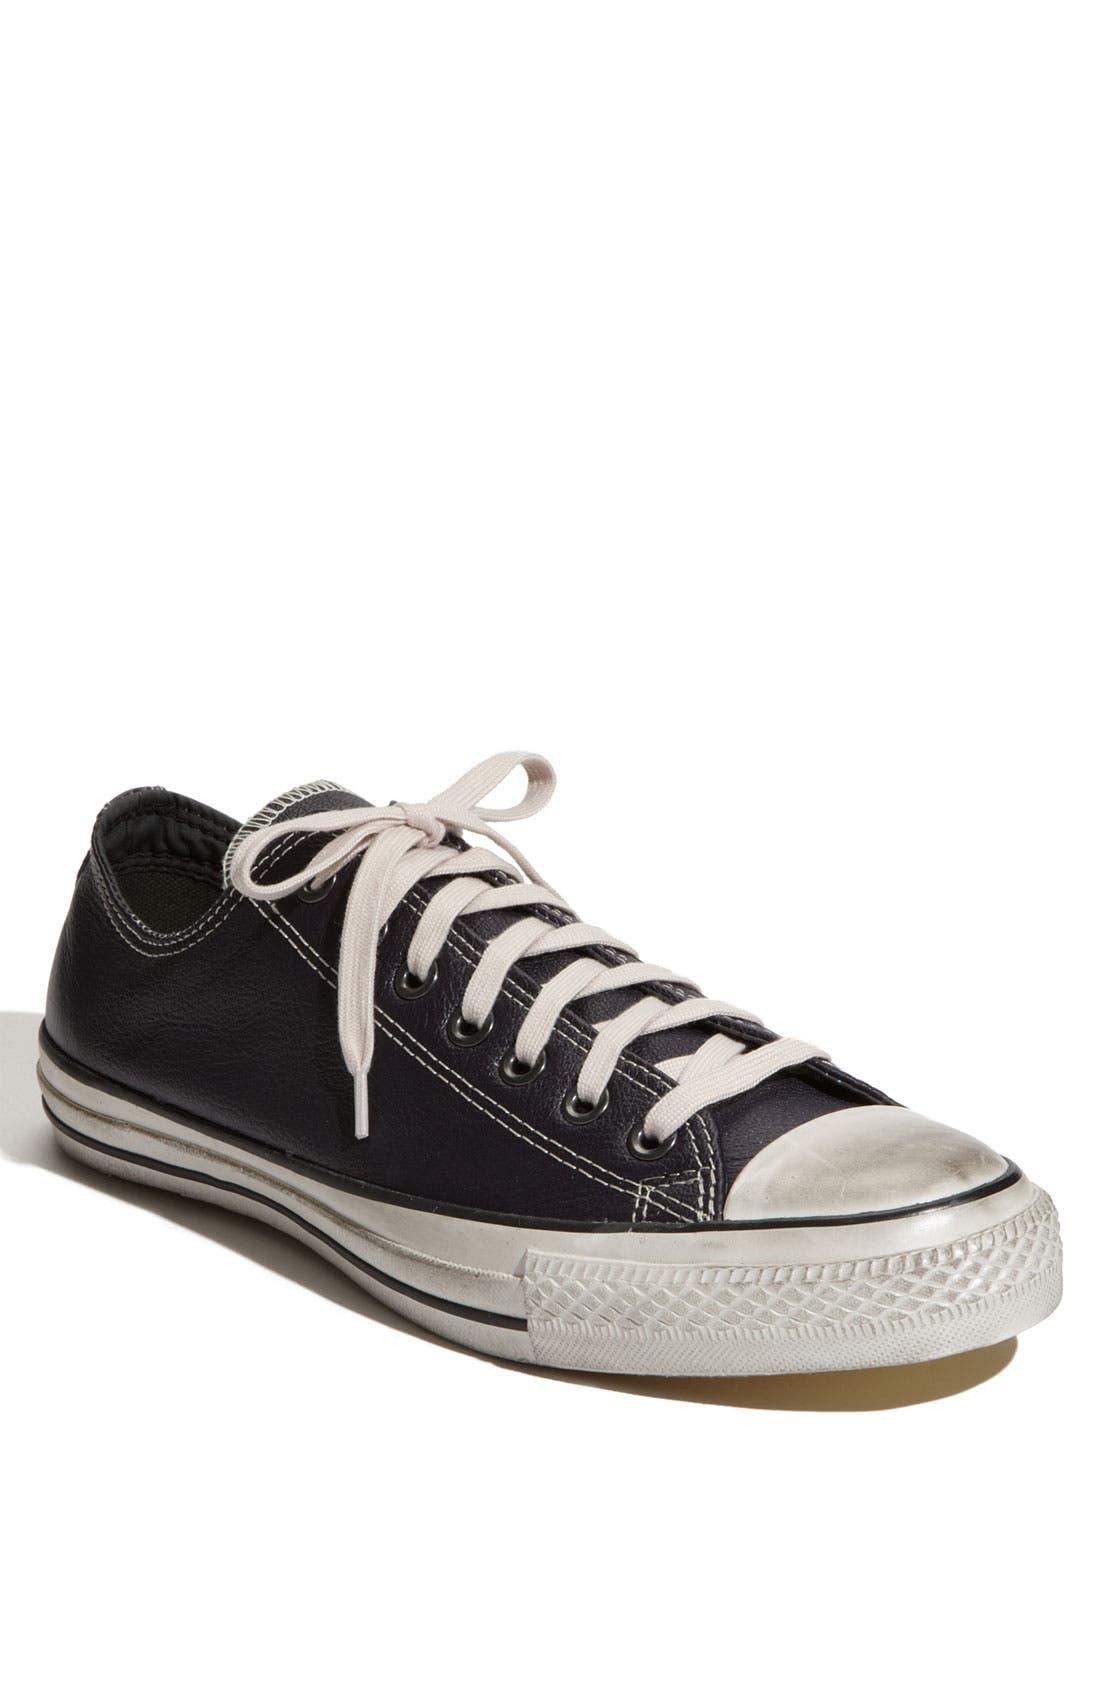 Alternate Image 1 Selected - Converse by John Varvatos Sneaker